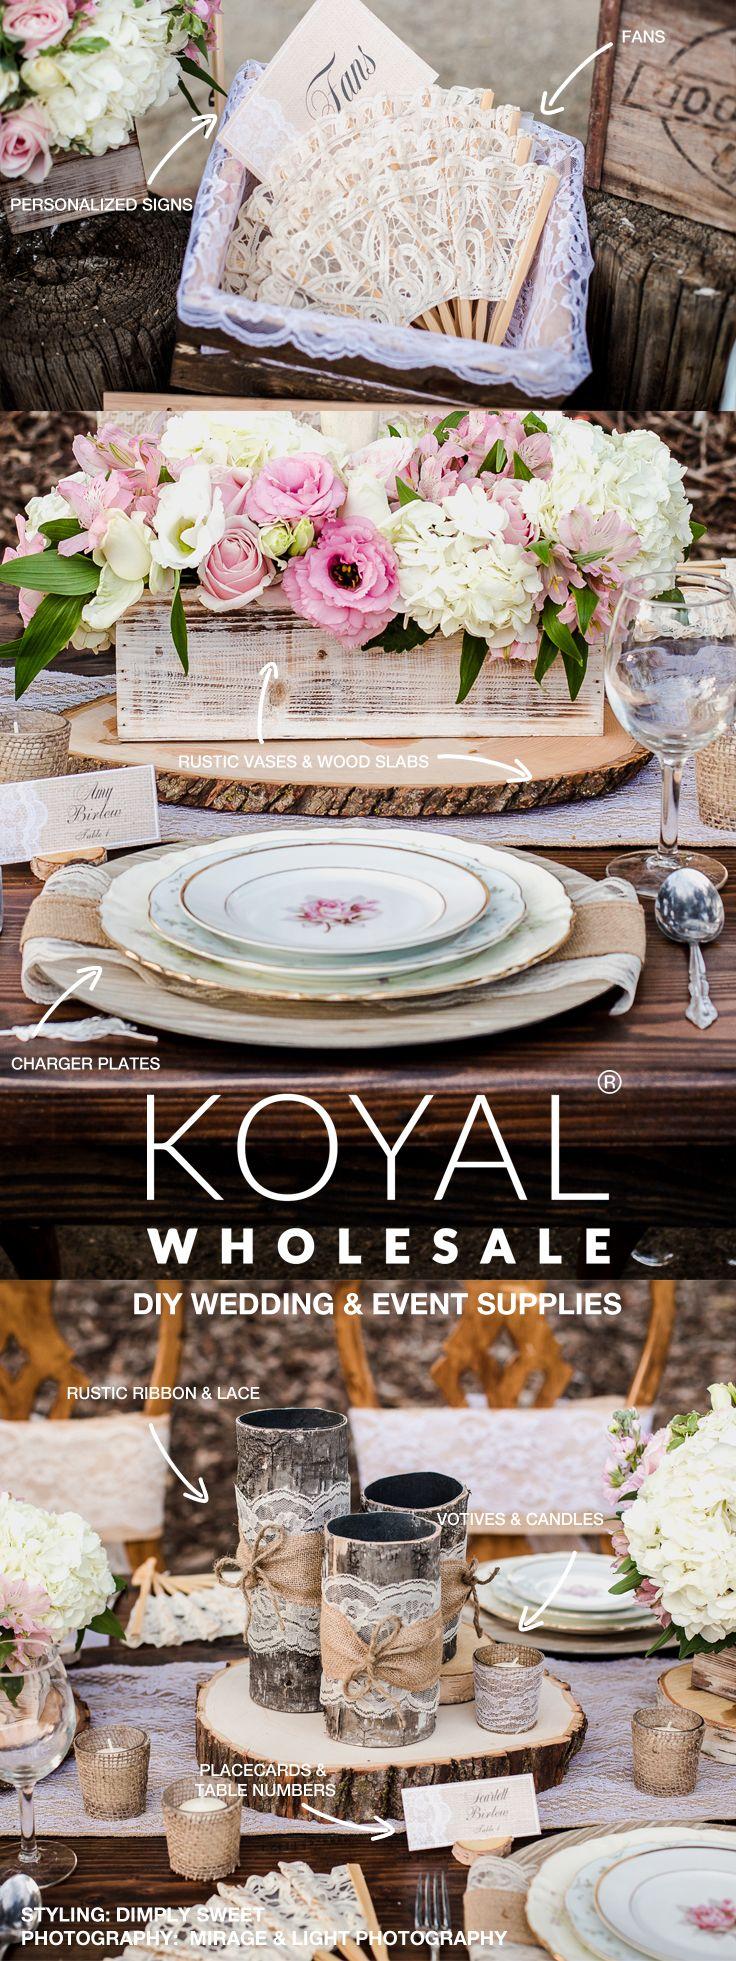 Koyal Wholesale Wedding Event Supplies For Diy Brides Centerpieces Charger Plates Votives Vases Wed Wedding Supplies Wholesale Diy Wedding Rustic Wedding